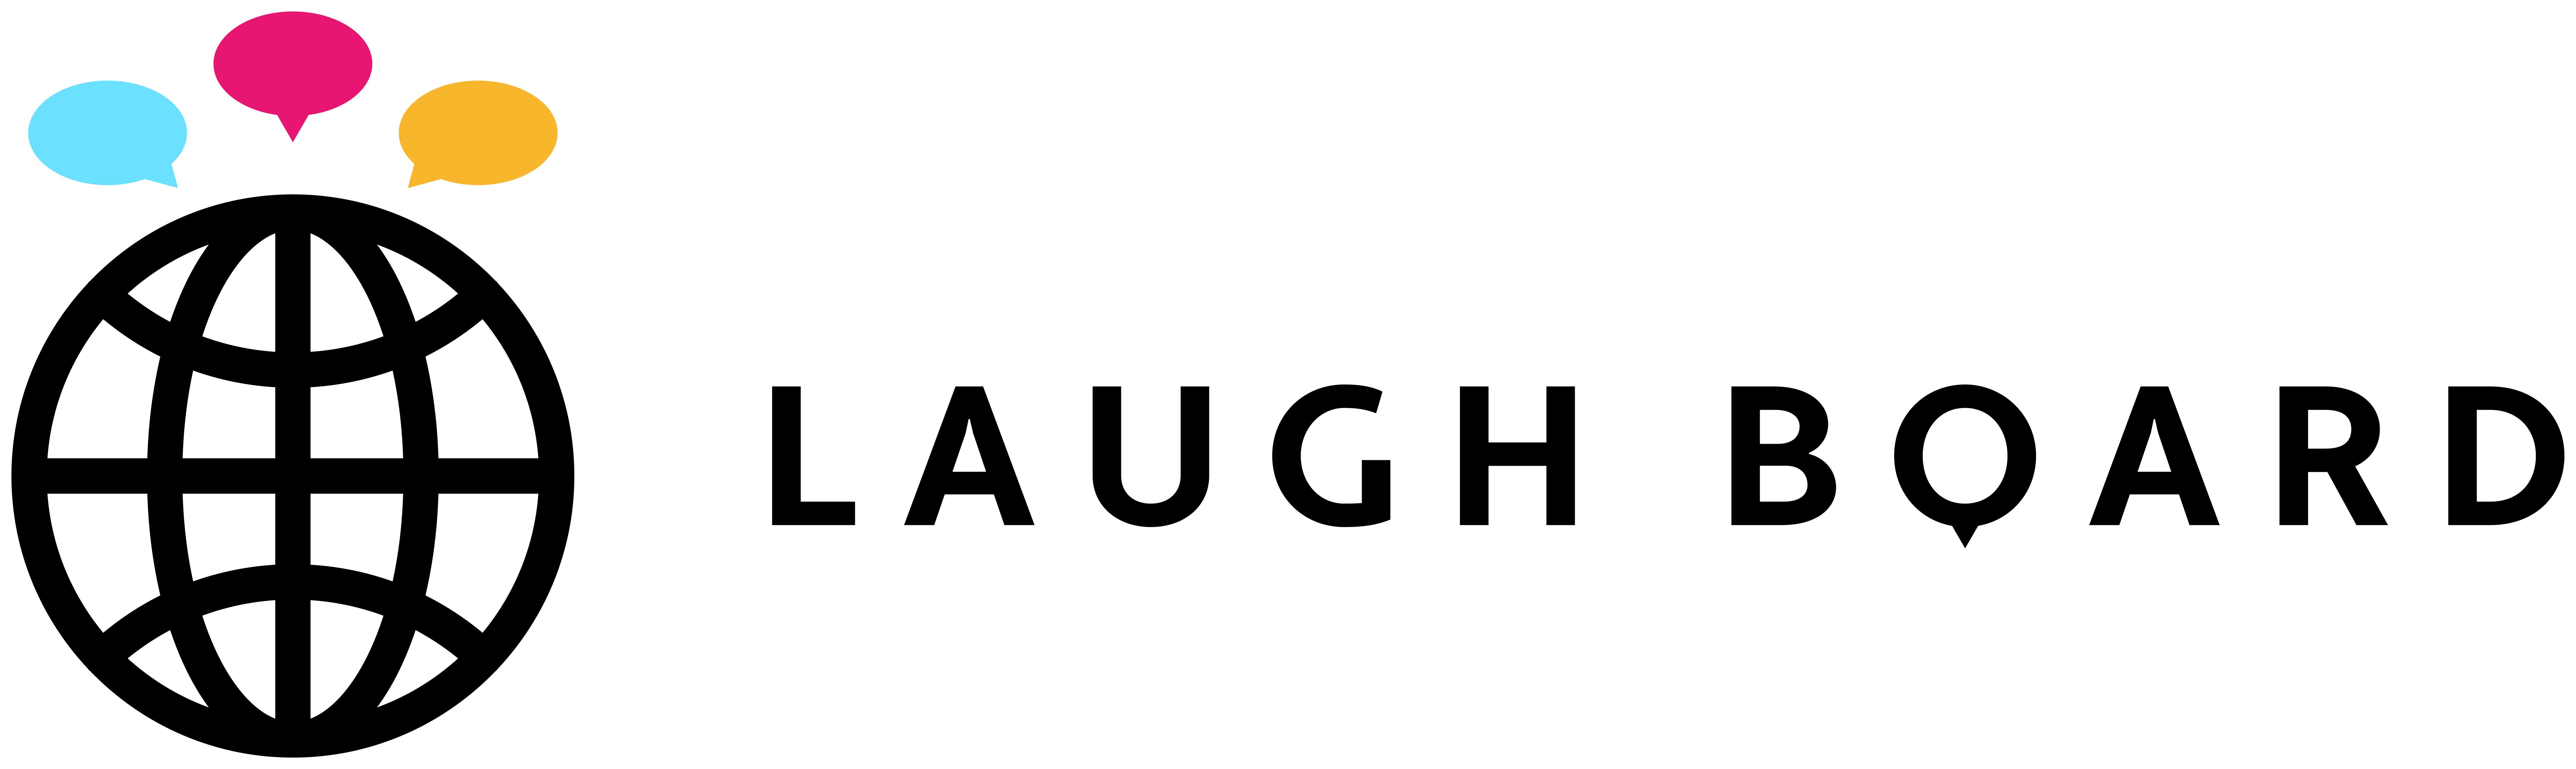 LaughBoard